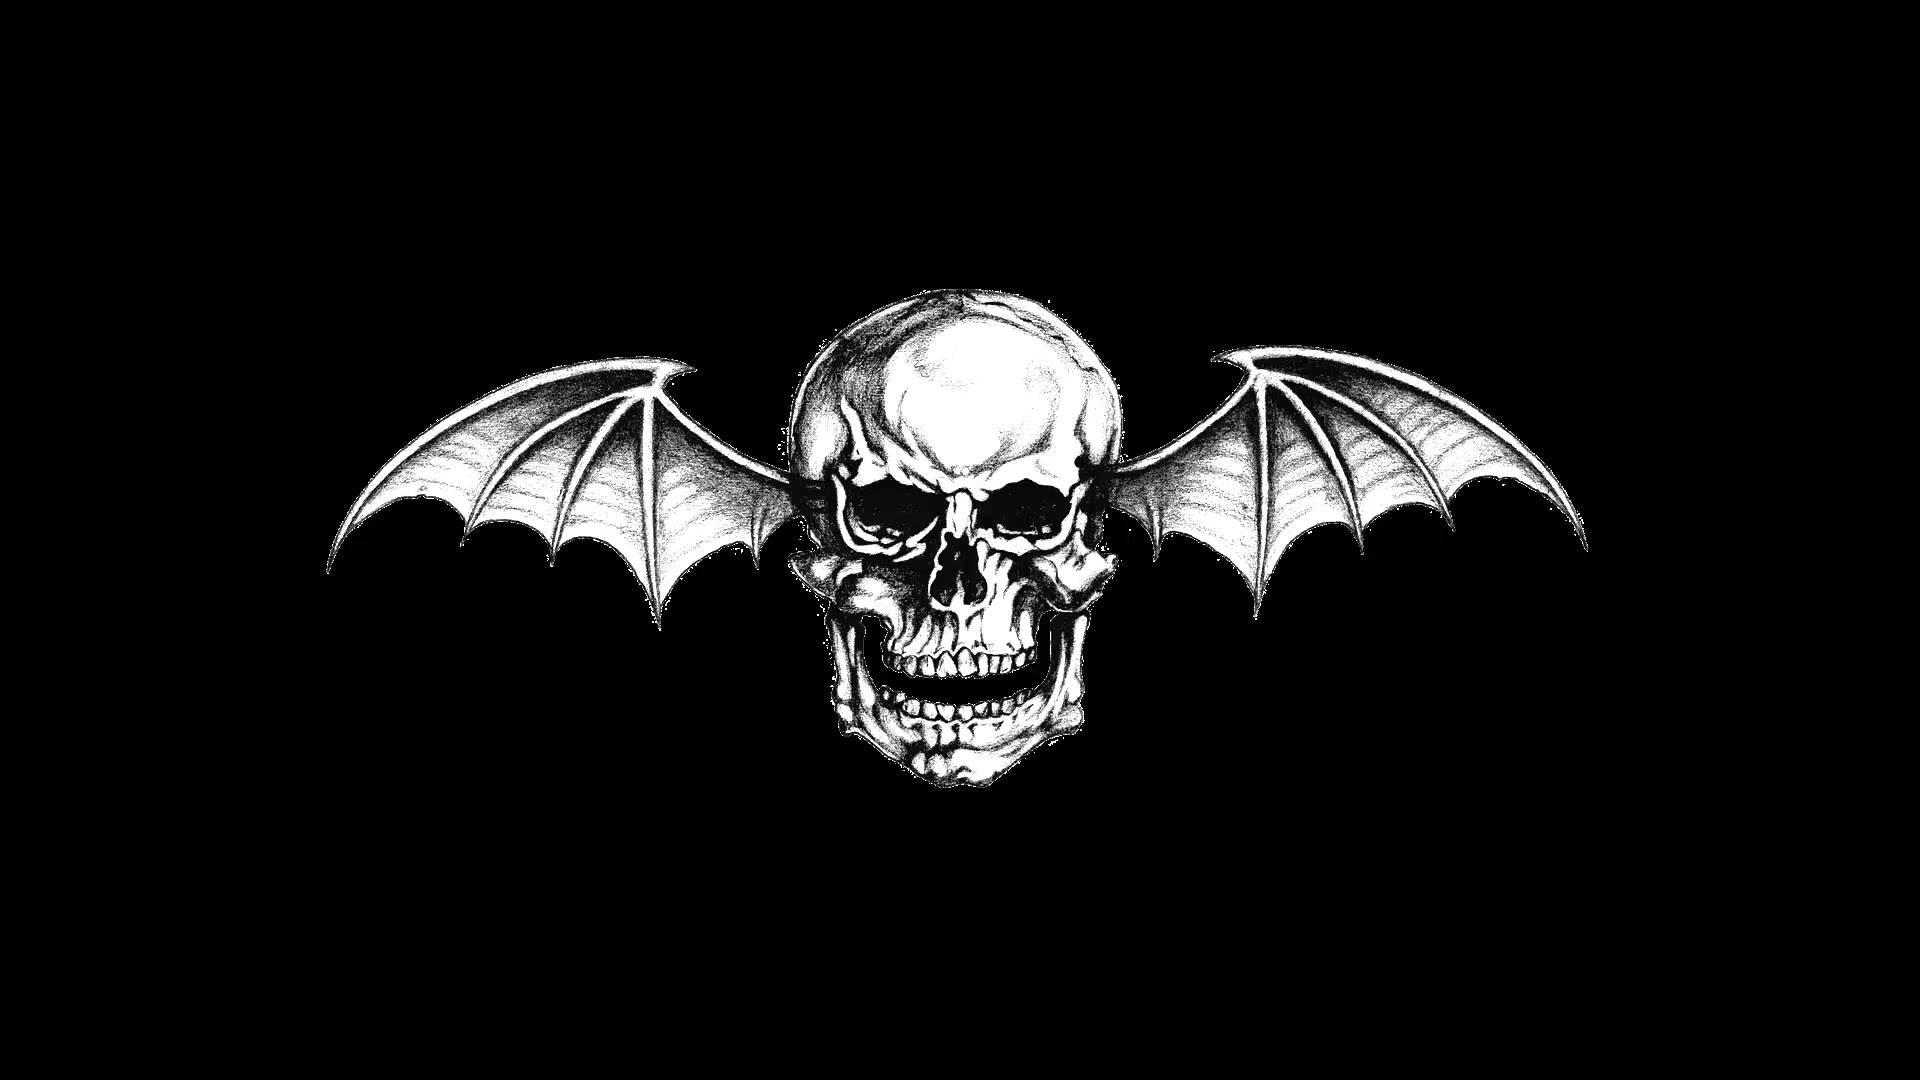 Avenged Sevenfold Deathbat Wallpaper. All …